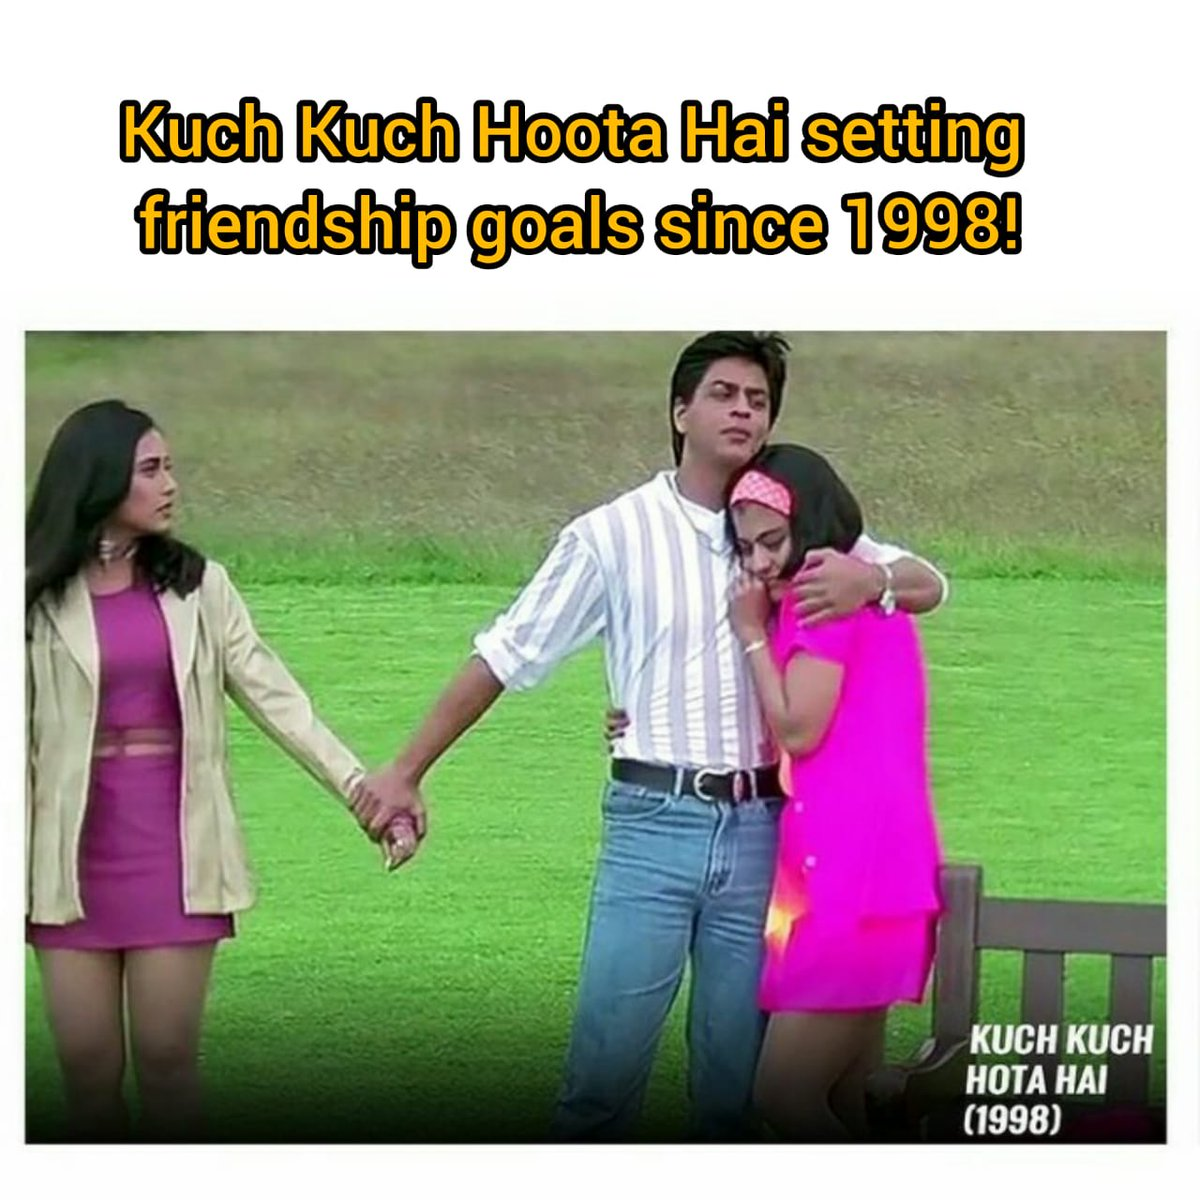 Kuch kuch hota hai since 1998!🤪 #KaranJohar #DharmaProductions #Bollywood #KuchKuchHotaHai #BestMovies #BollywoodMovies #Entertainment #BestFilmMaker #BestDirector #BestMovie #Director https://t.co/Jv0B66gj3l